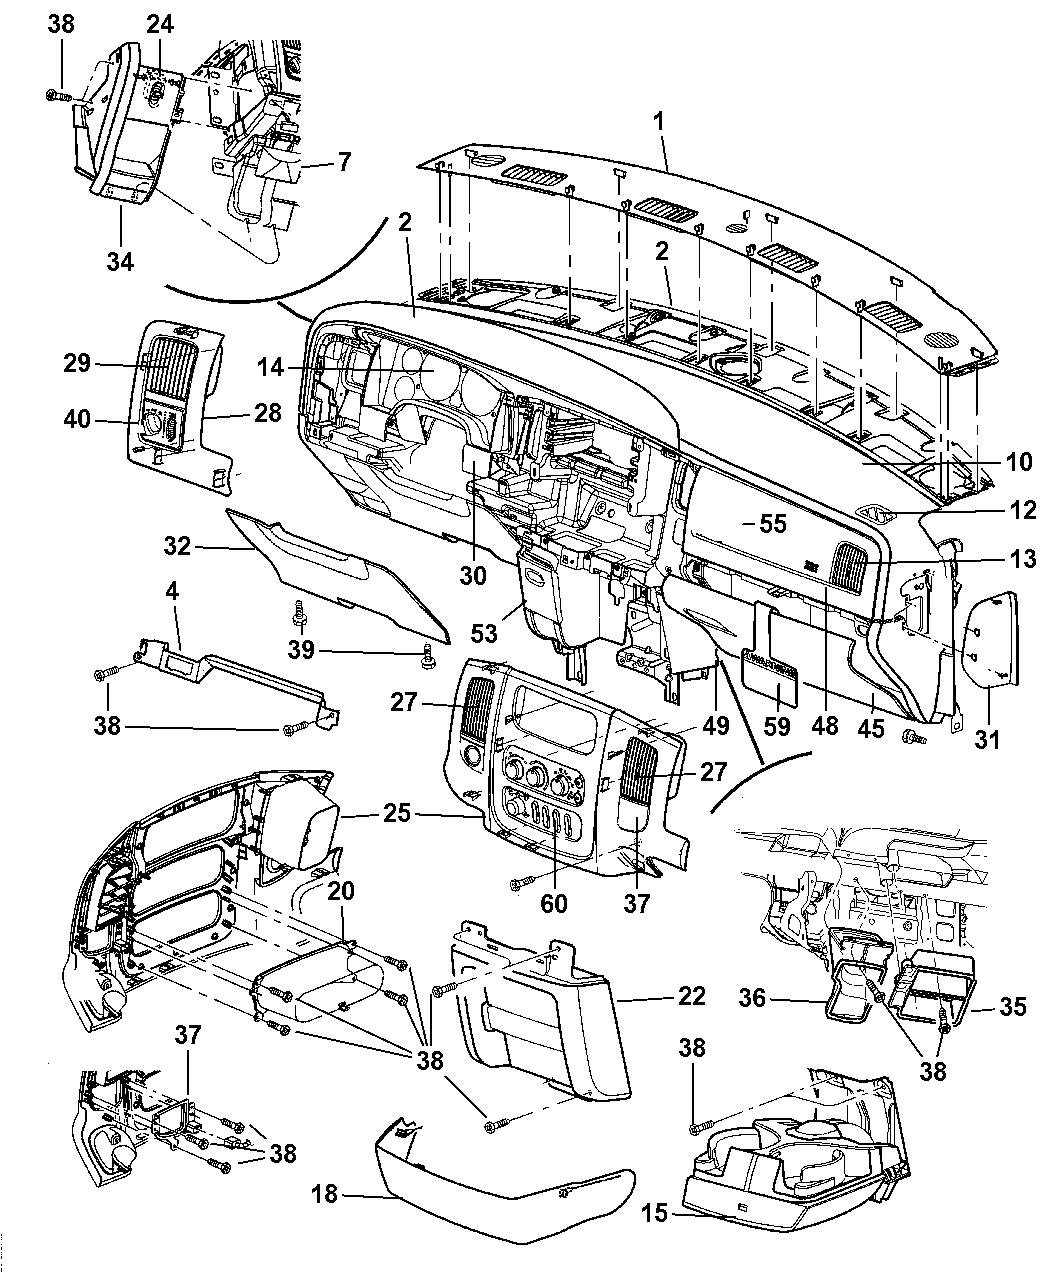 2005 dodge ram 1500 instrument panel